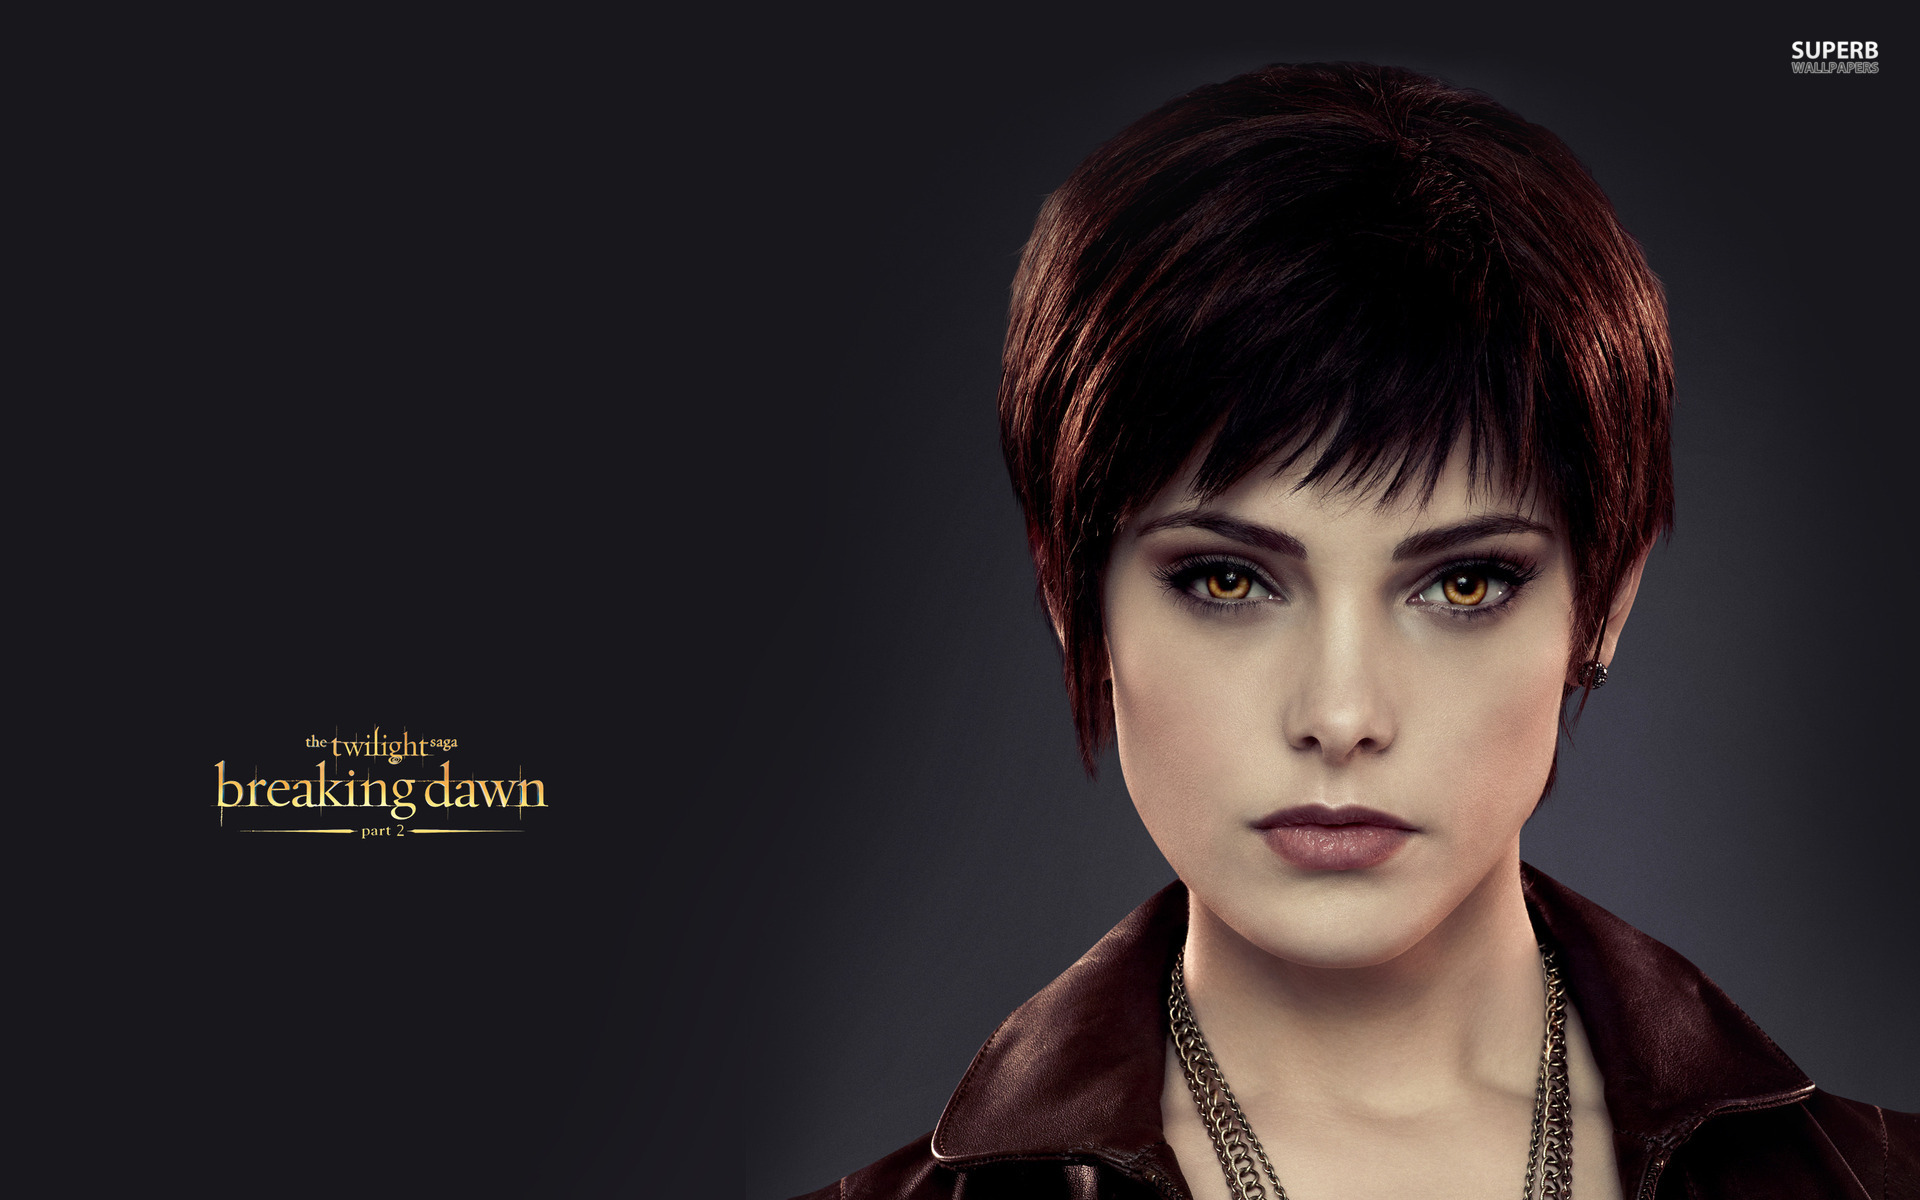 Twilight Saga Breaking Dawn Part N Iphone Wallpapers - Twilight Saga: Breaking Dawn - Part 2 (2012) - HD Wallpaper